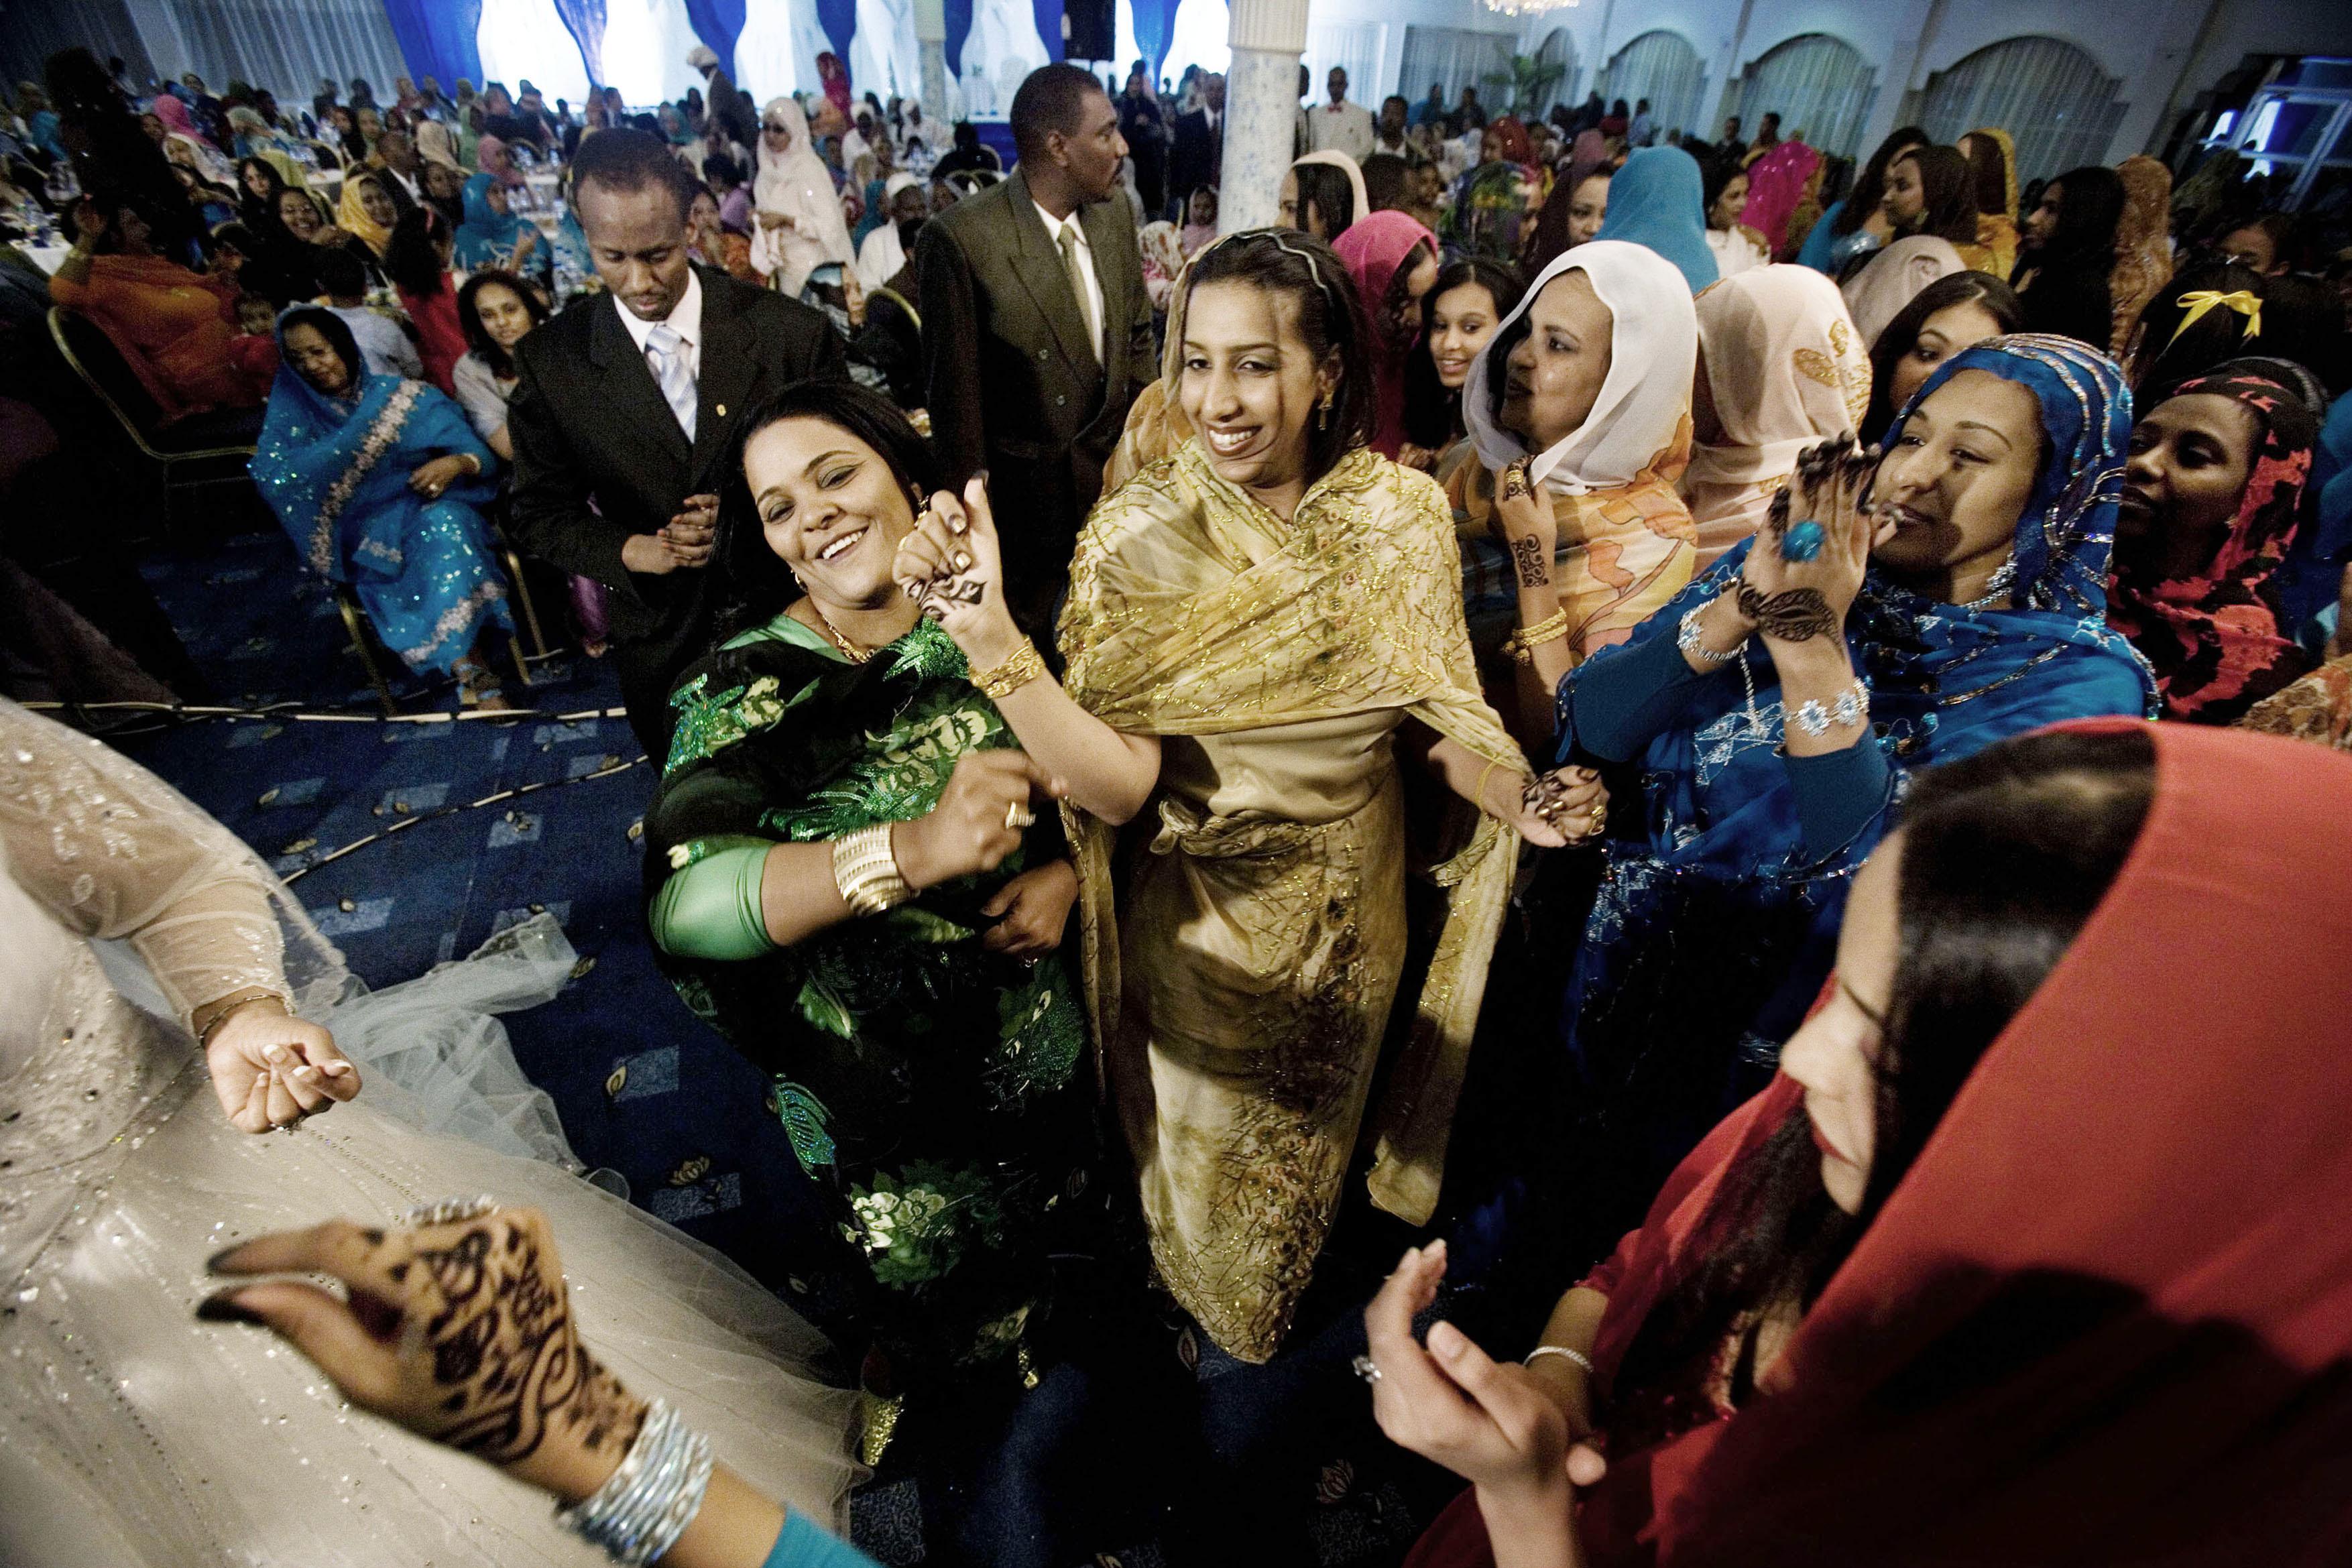 Sudanese wedding rituals and traditions - Khartoum Sudan January 11 2007